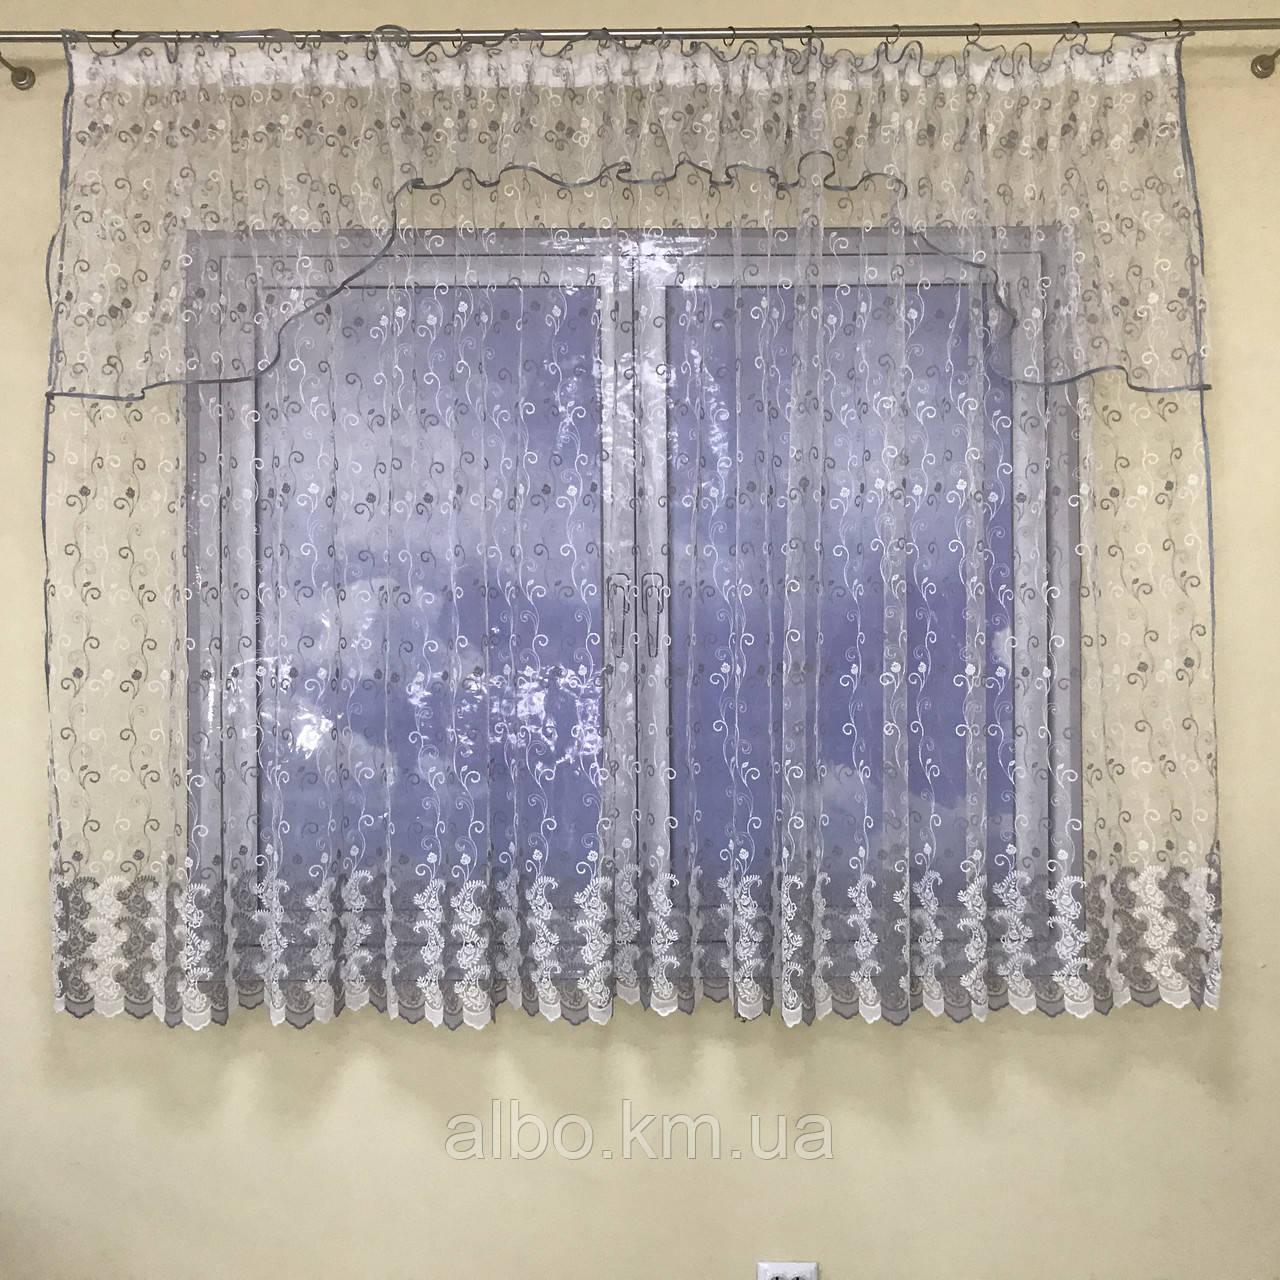 Короткая тюль в зал из турецкого фатина ALBO 400x180 cm Бело-серая (KU-140-10)